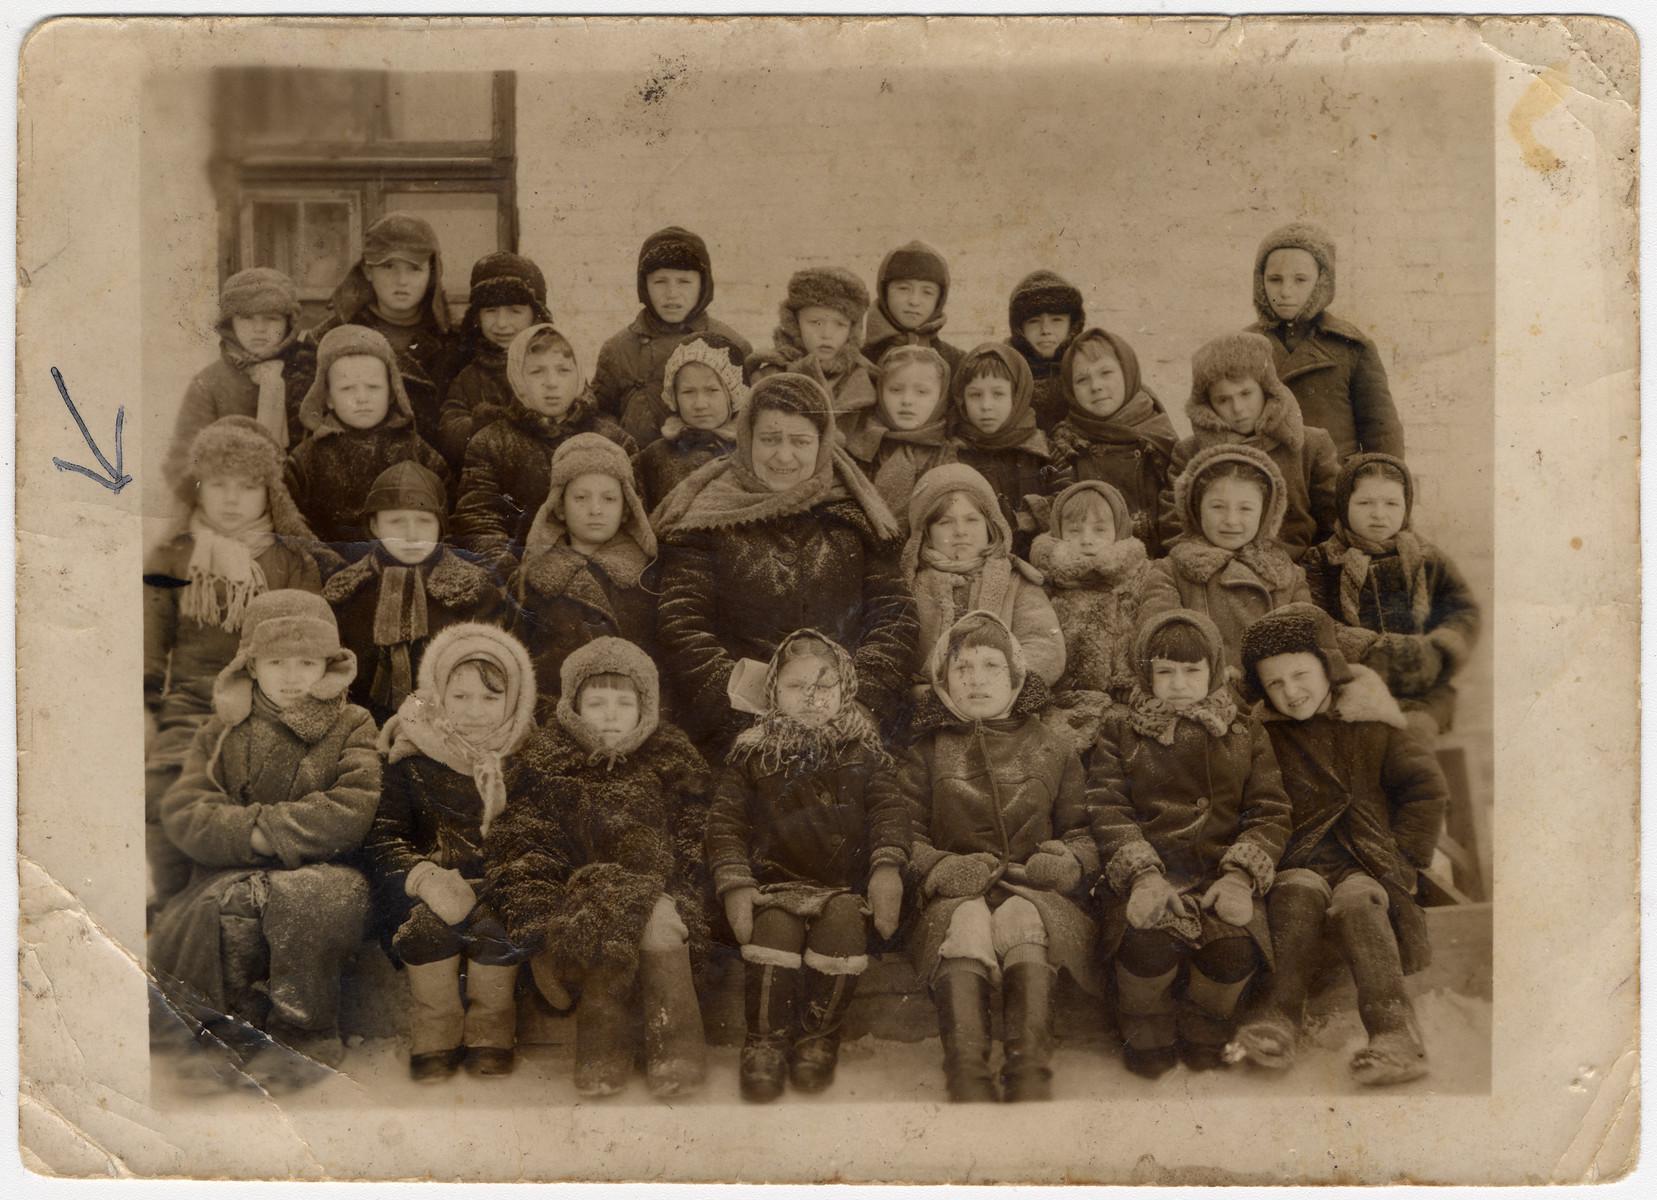 School children [probably in the Zhmerynka ghetto in Transnistria].